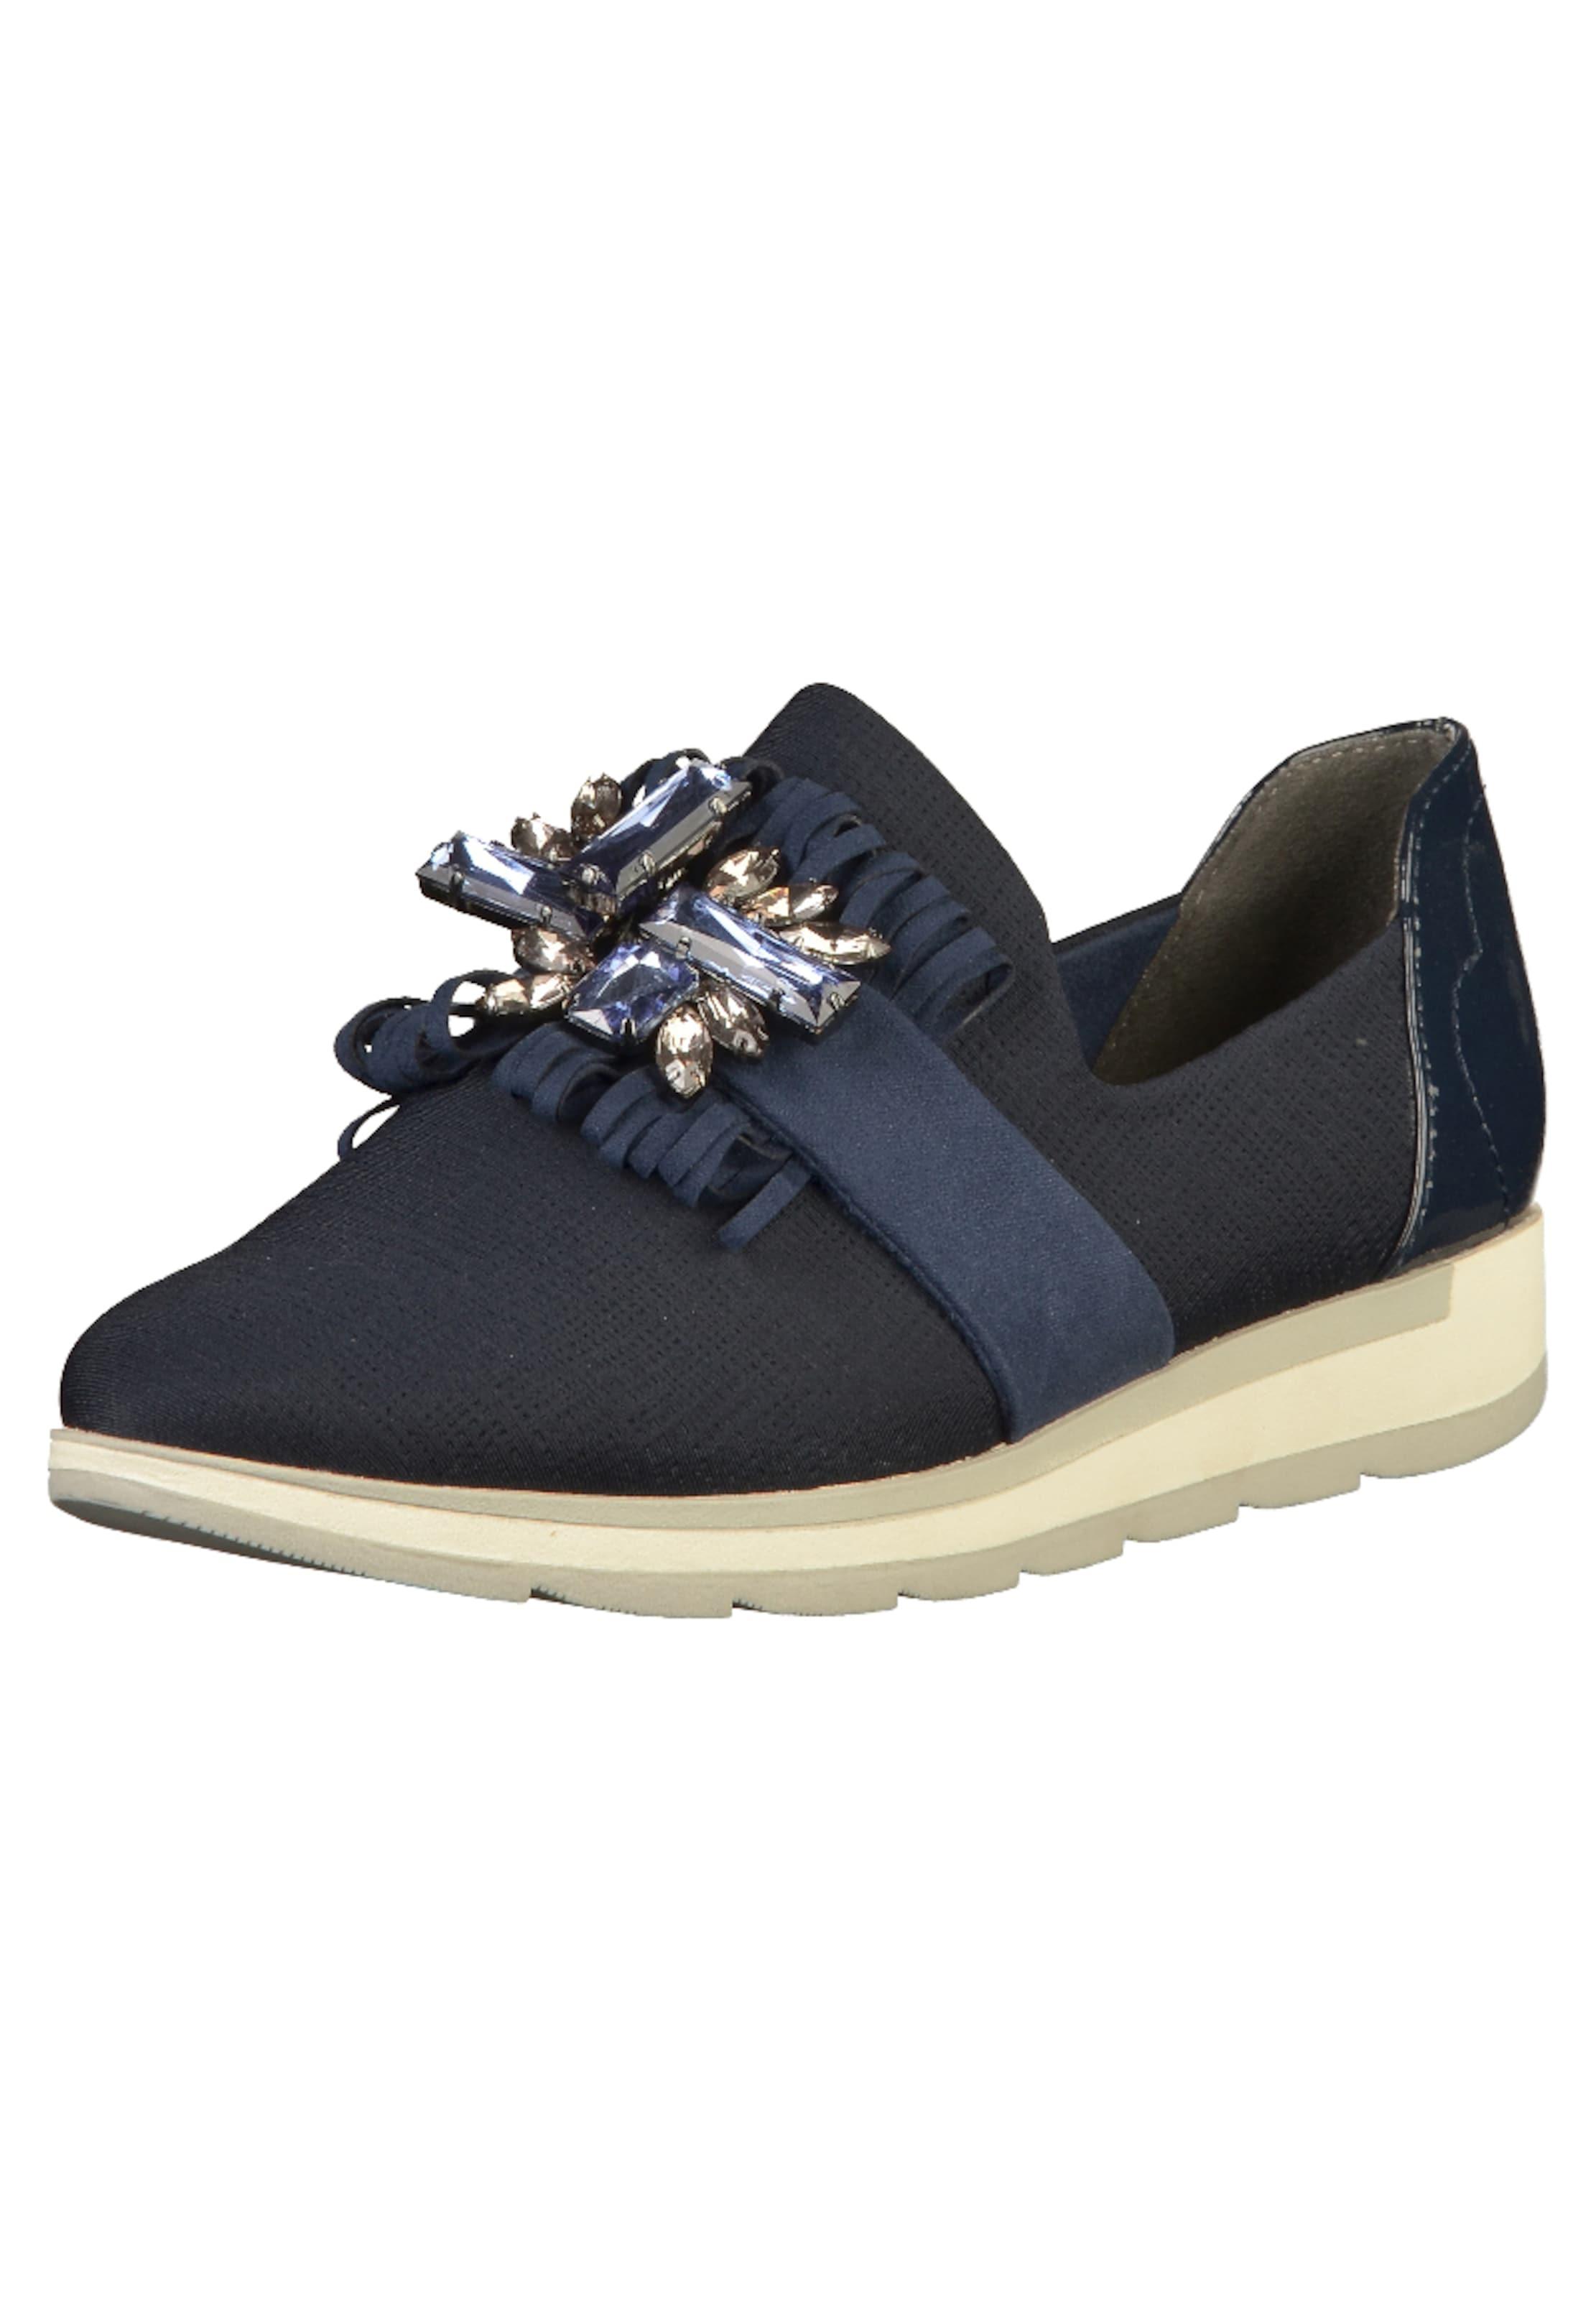 MARCO TOZZI Sneaker Verschleißfeste Verschleißfeste Sneaker billige Schuhe 0ae4e7